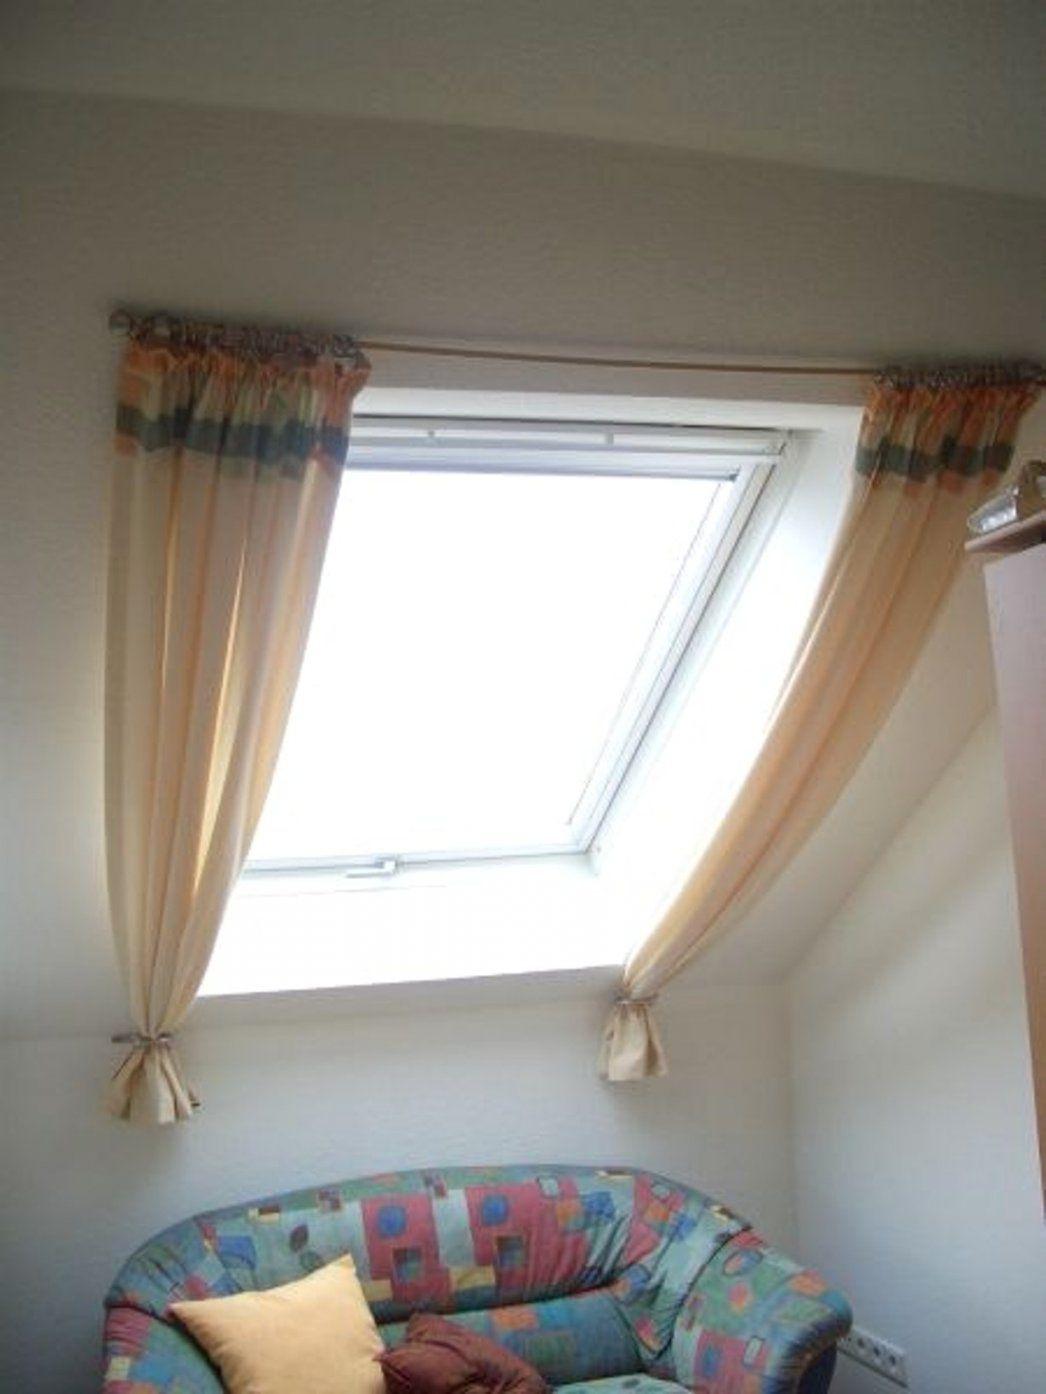 Ehrfürchtig Gardinen Dachfenster Ideen Ideen von Gardinen Für Dachfenster Ideen Photo